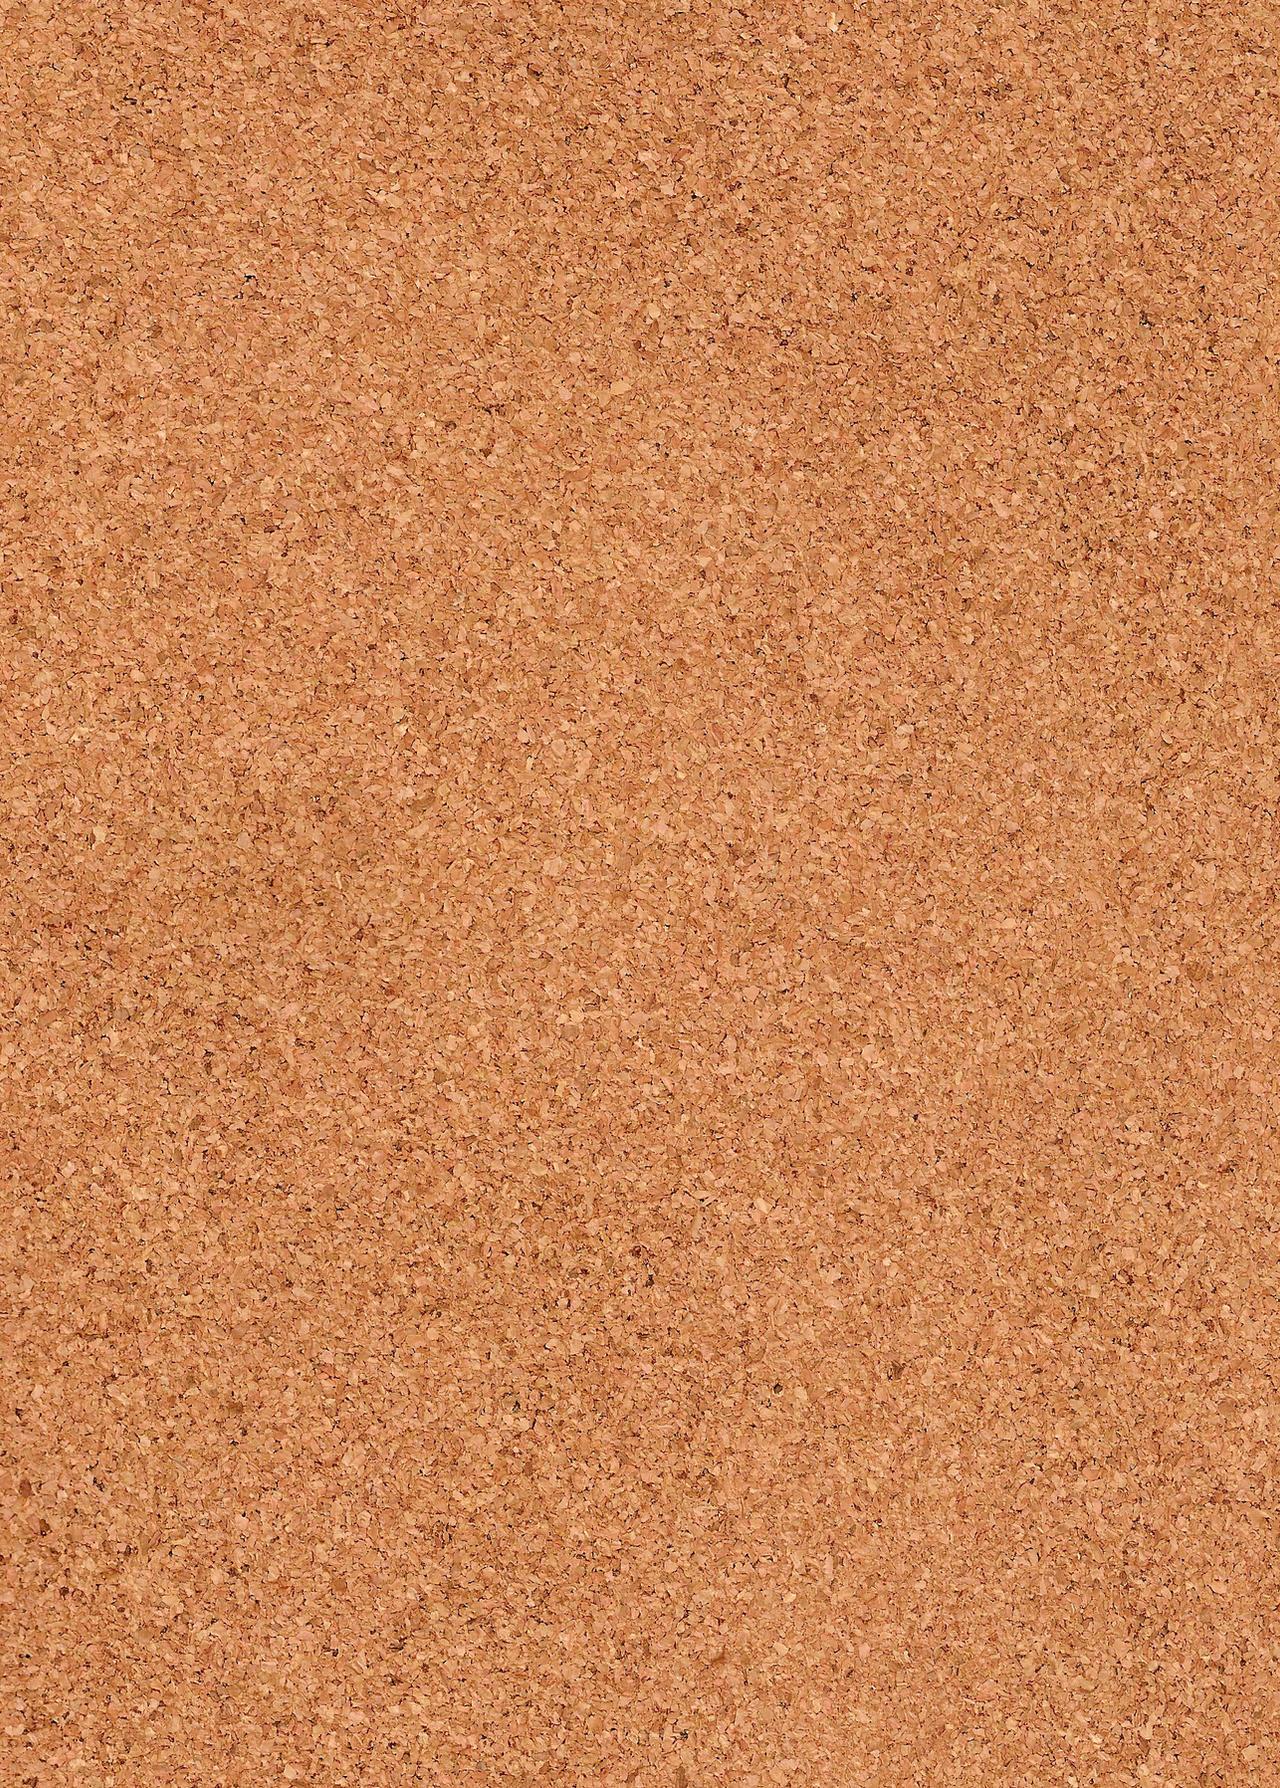 Corkboard Wood Cork Composite